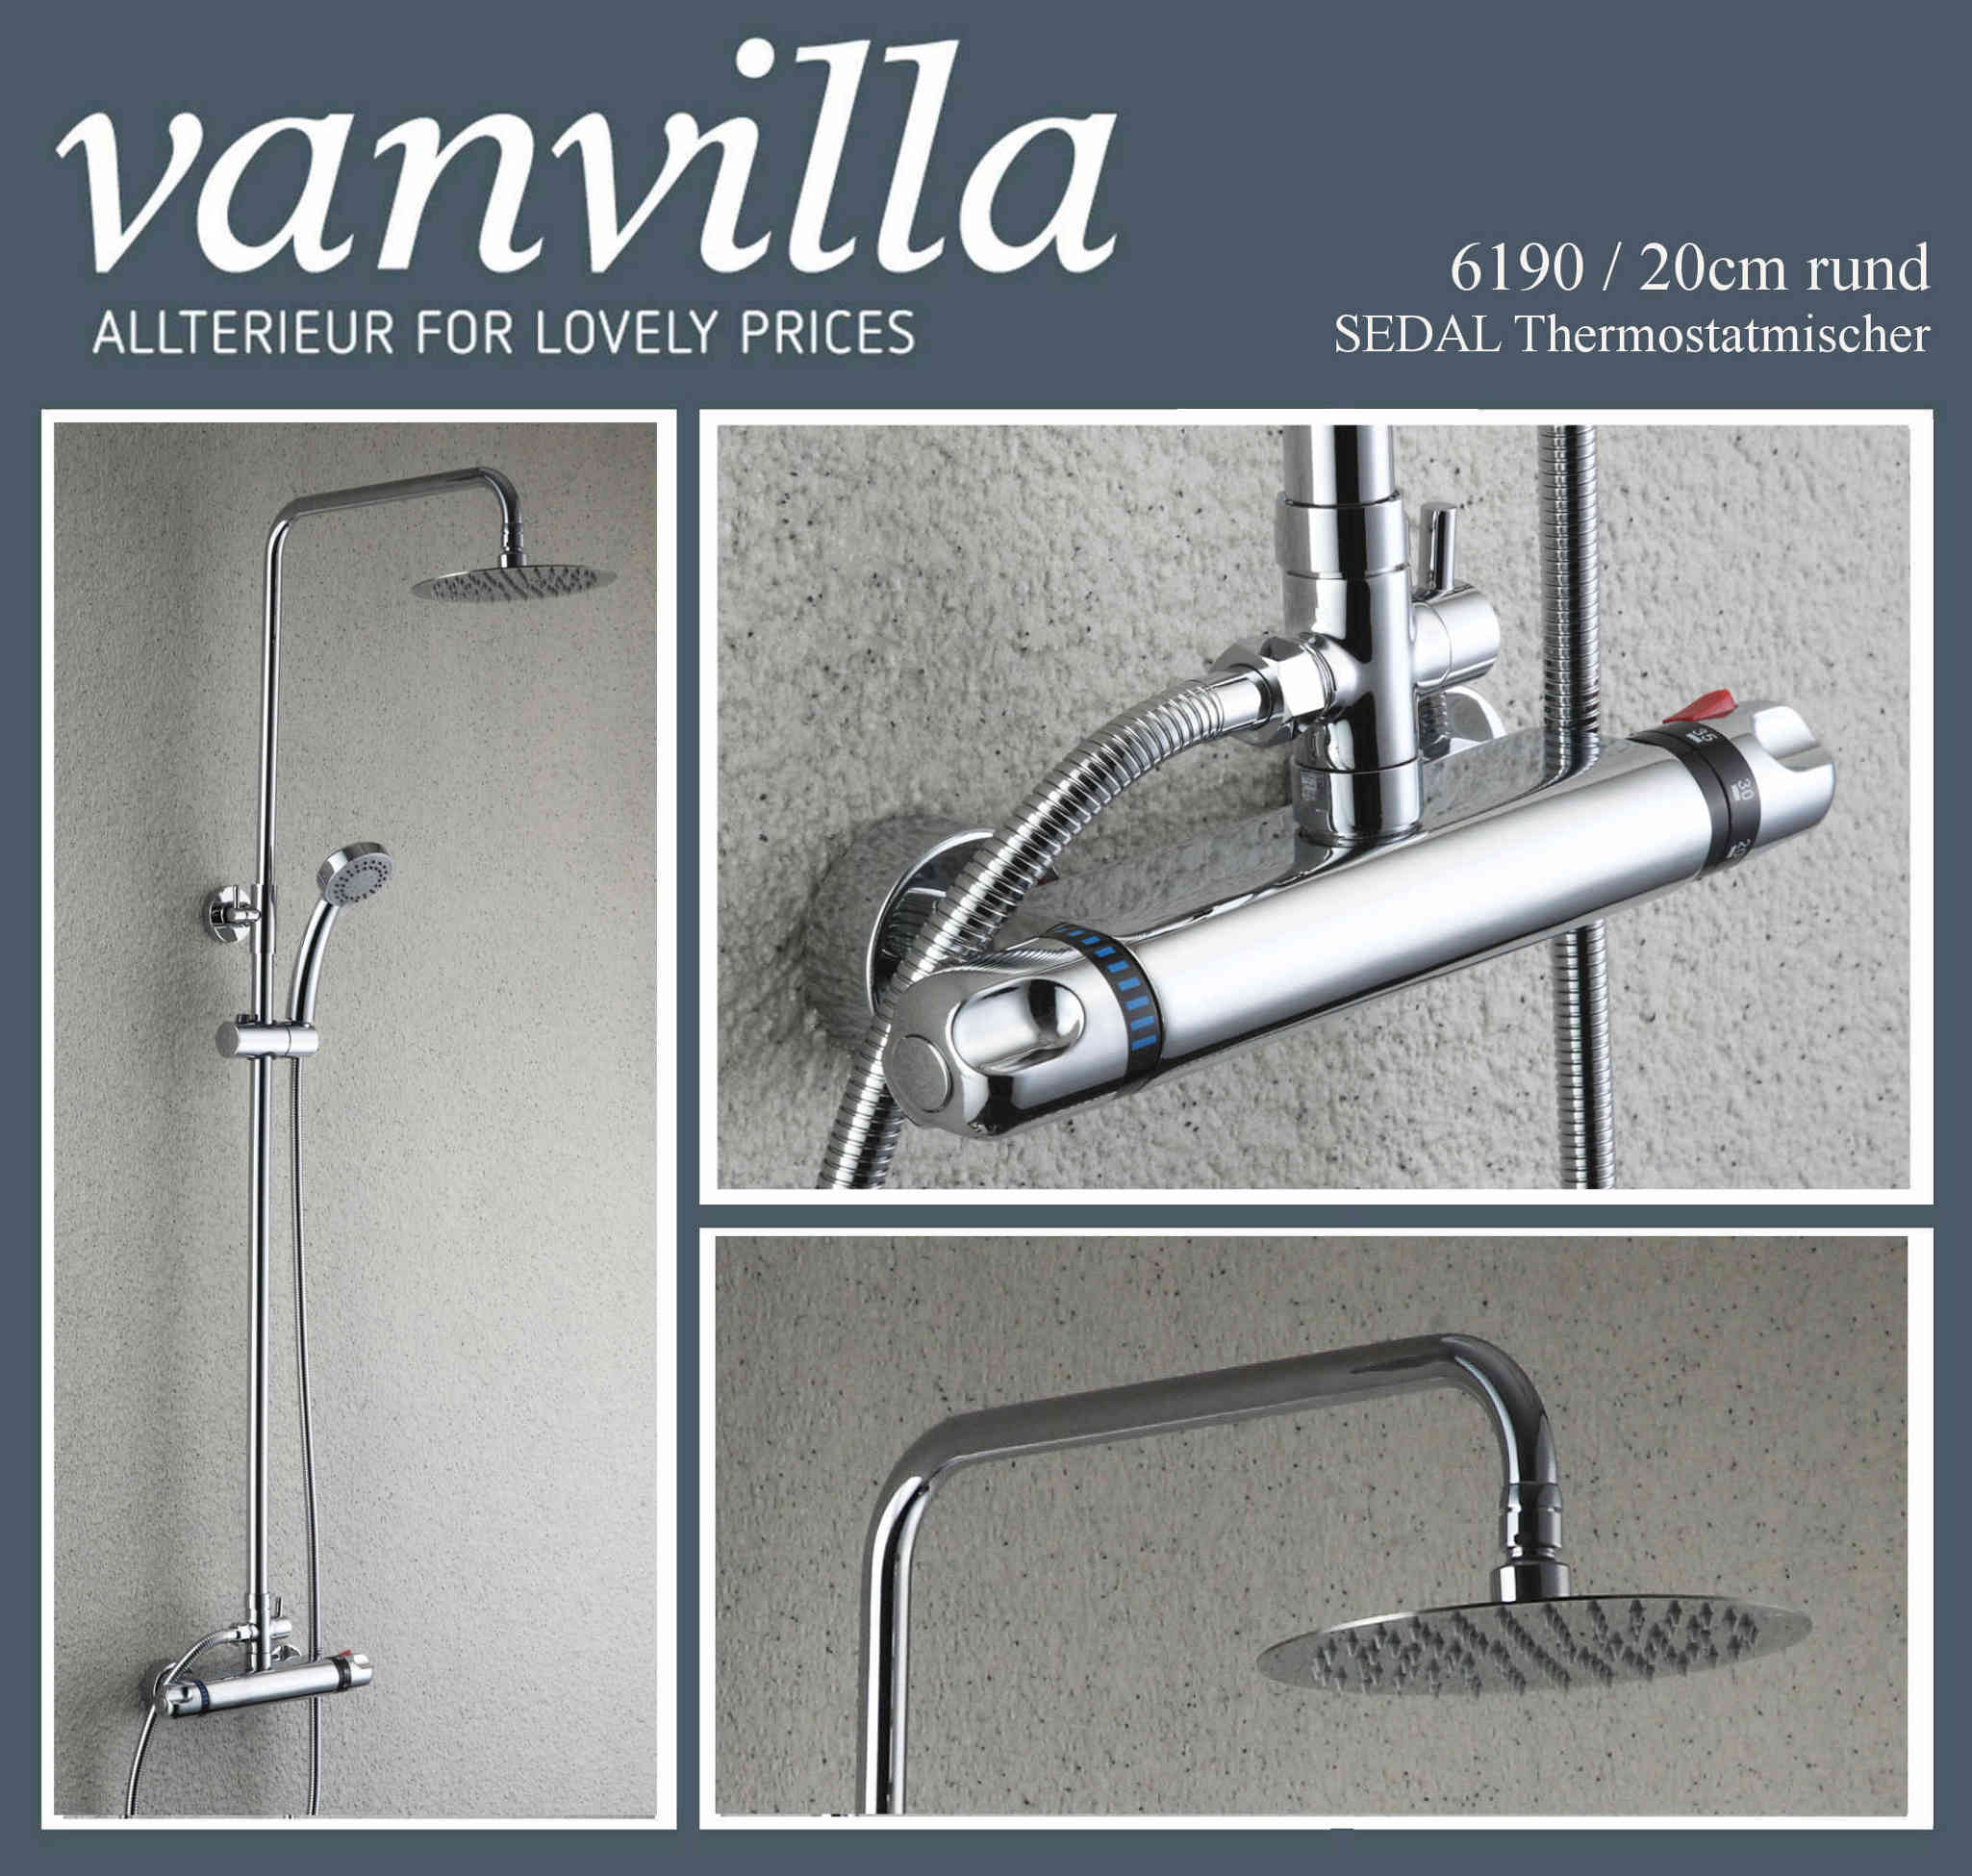 dusch set vanvilla thermostat duschkopf 20cm rund edelstahl poliert 6190. Black Bedroom Furniture Sets. Home Design Ideas